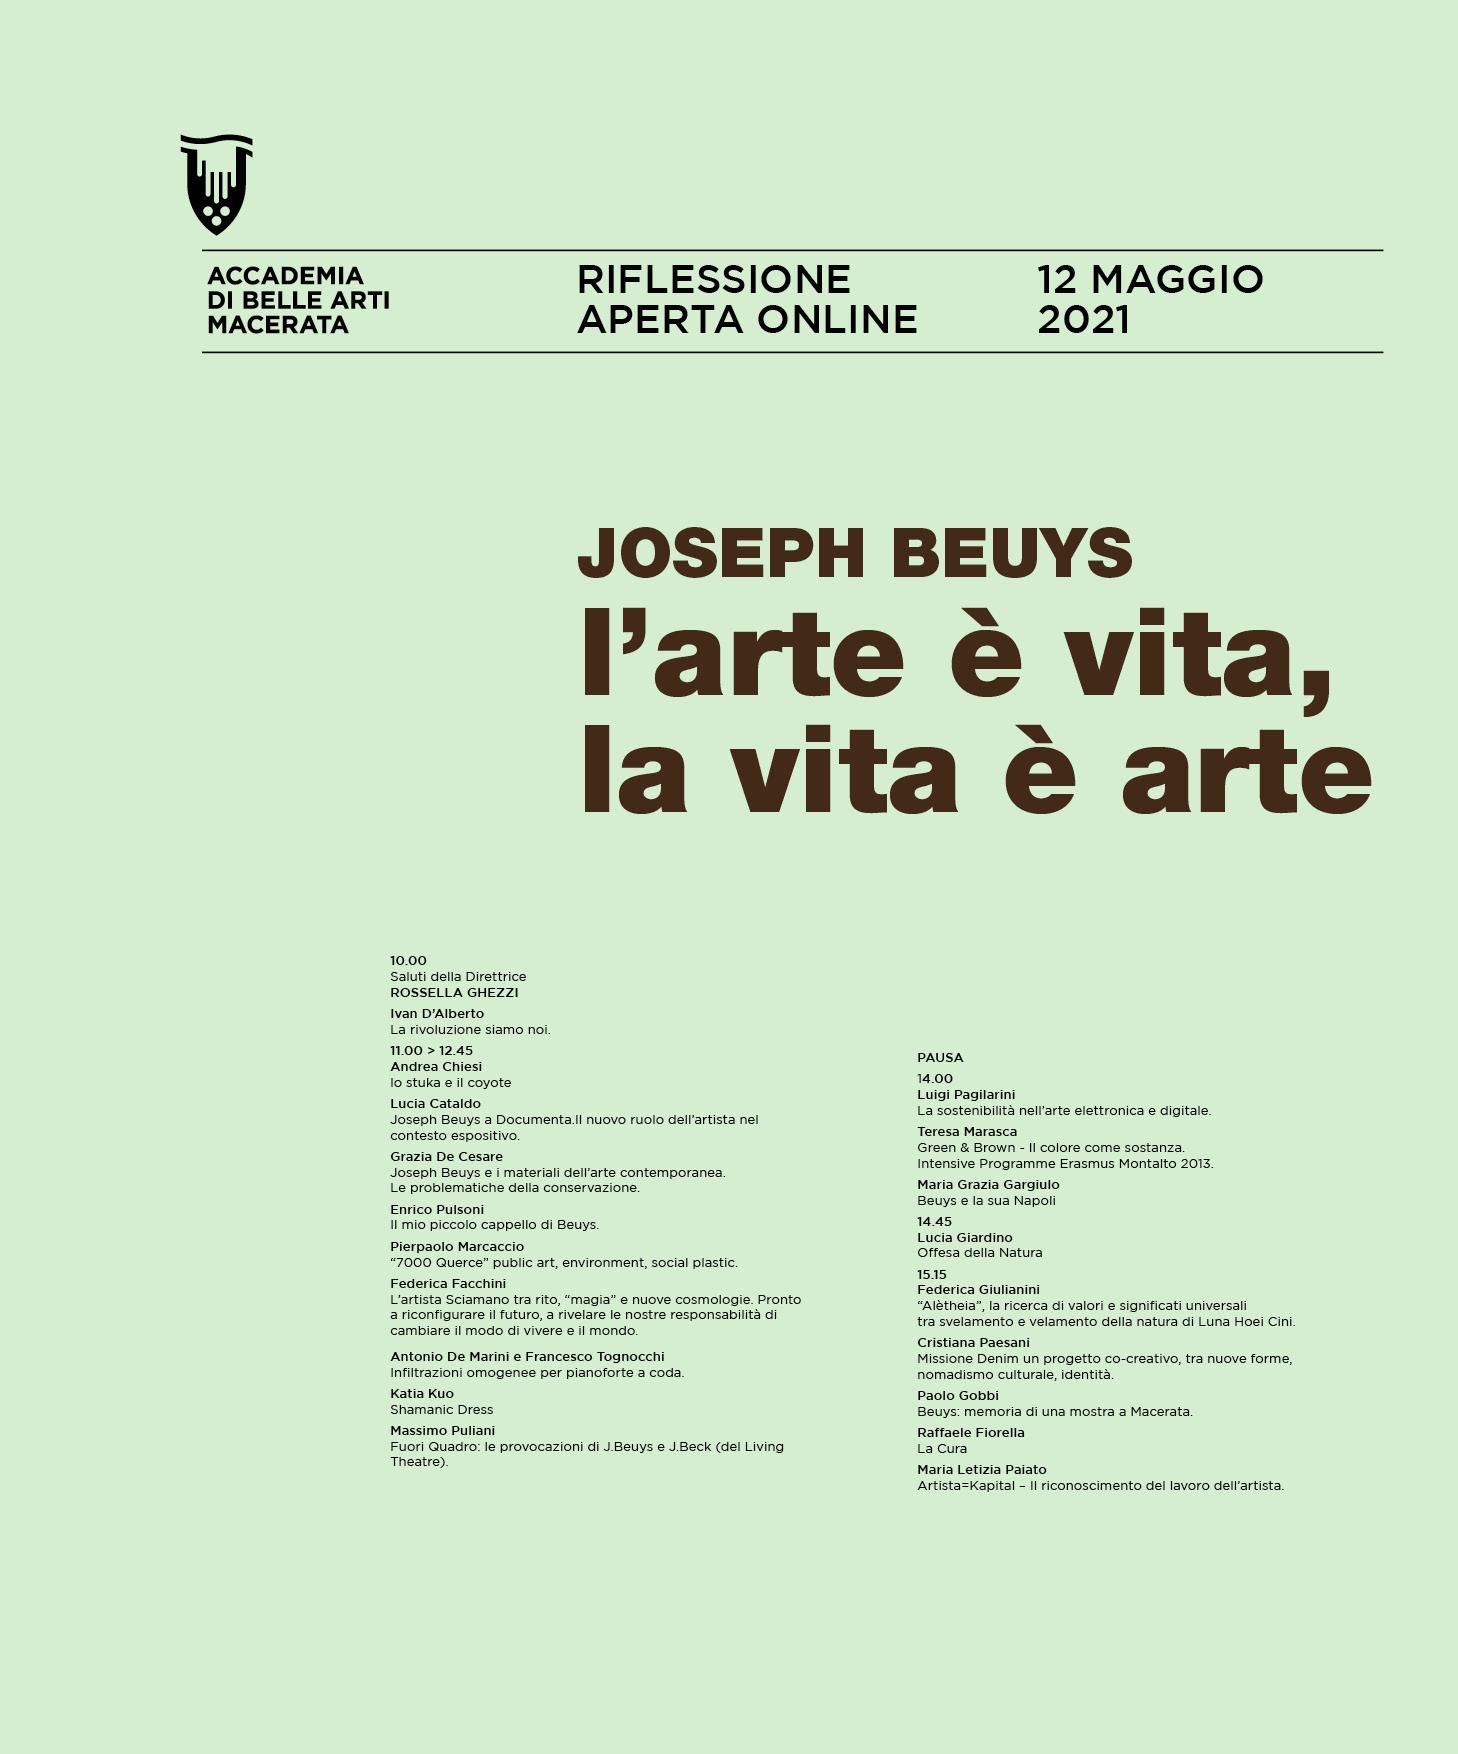 JOSEPH BEUYS. L'ARTE È VITA, LA VITA È ARTE